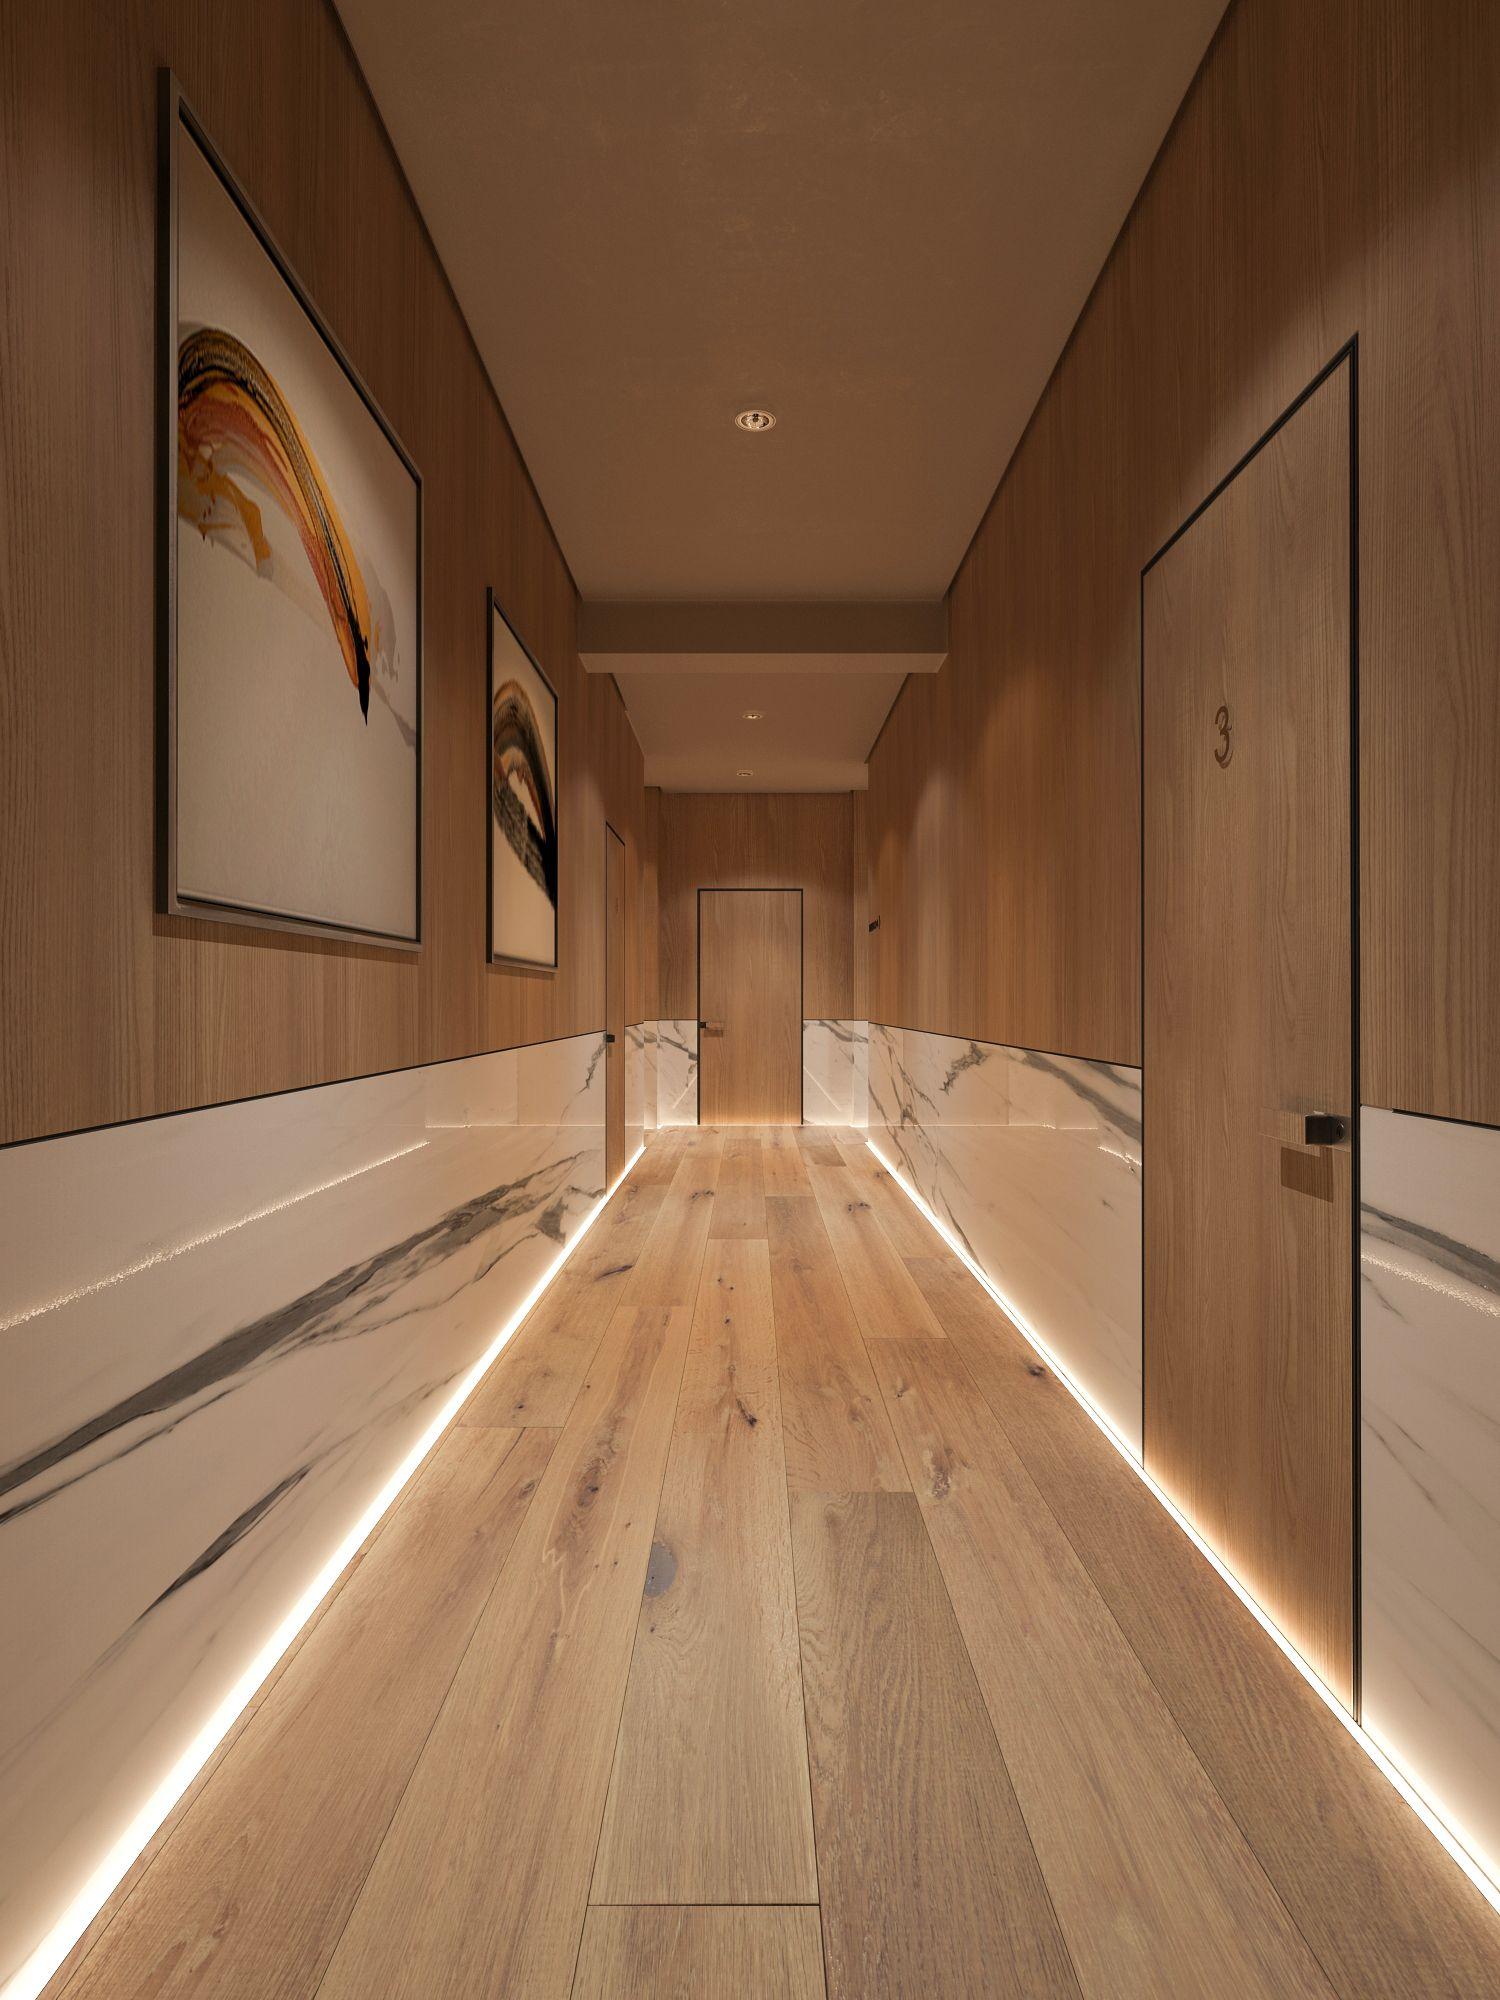 Mini hotel interiors pinterest dise o de interiores for Diseno de iluminacion de interiores